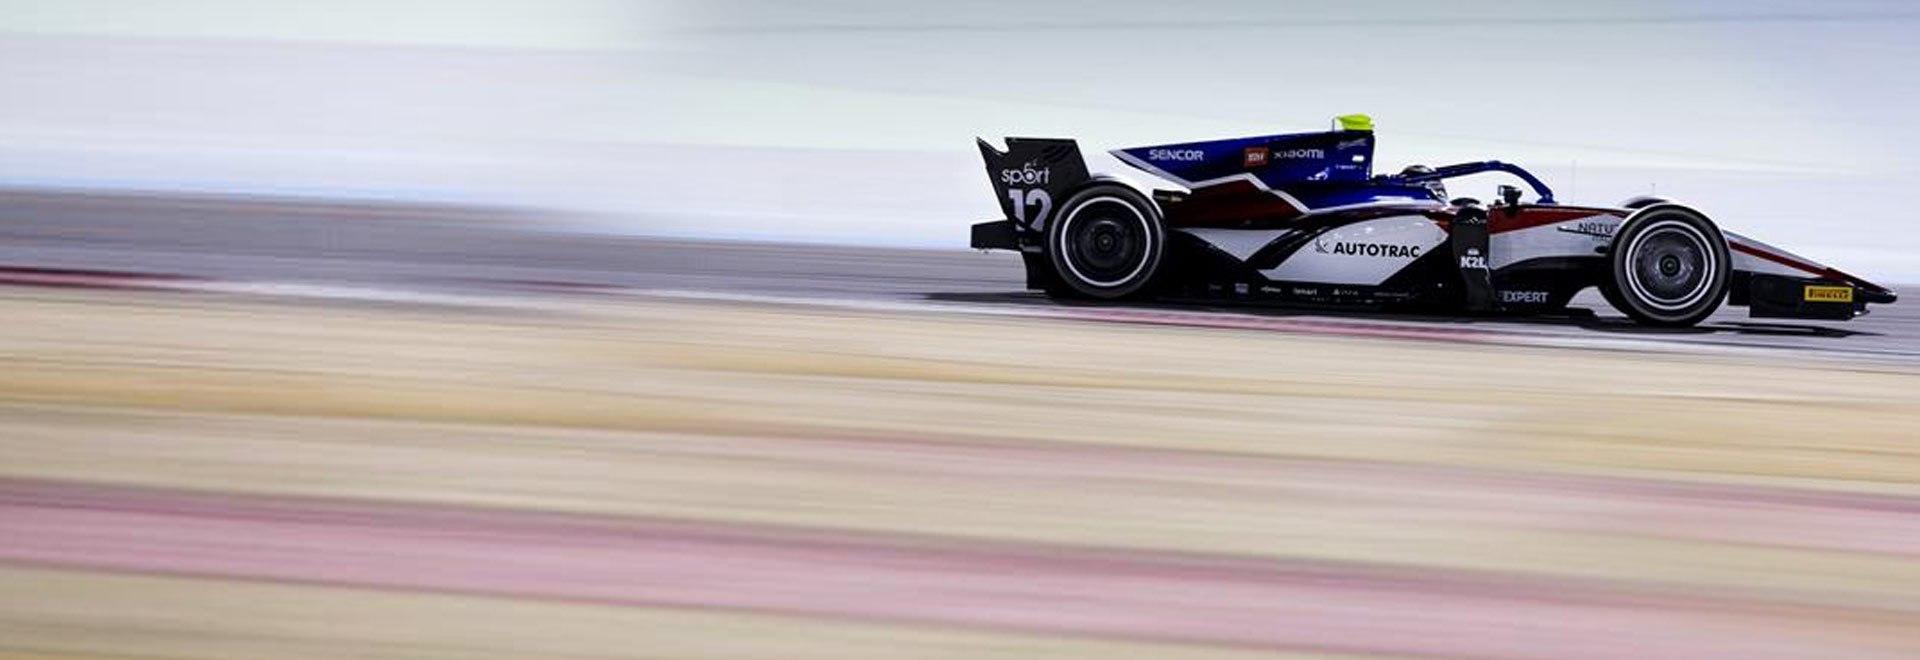 GP 70° Anniversario. Sprint Race